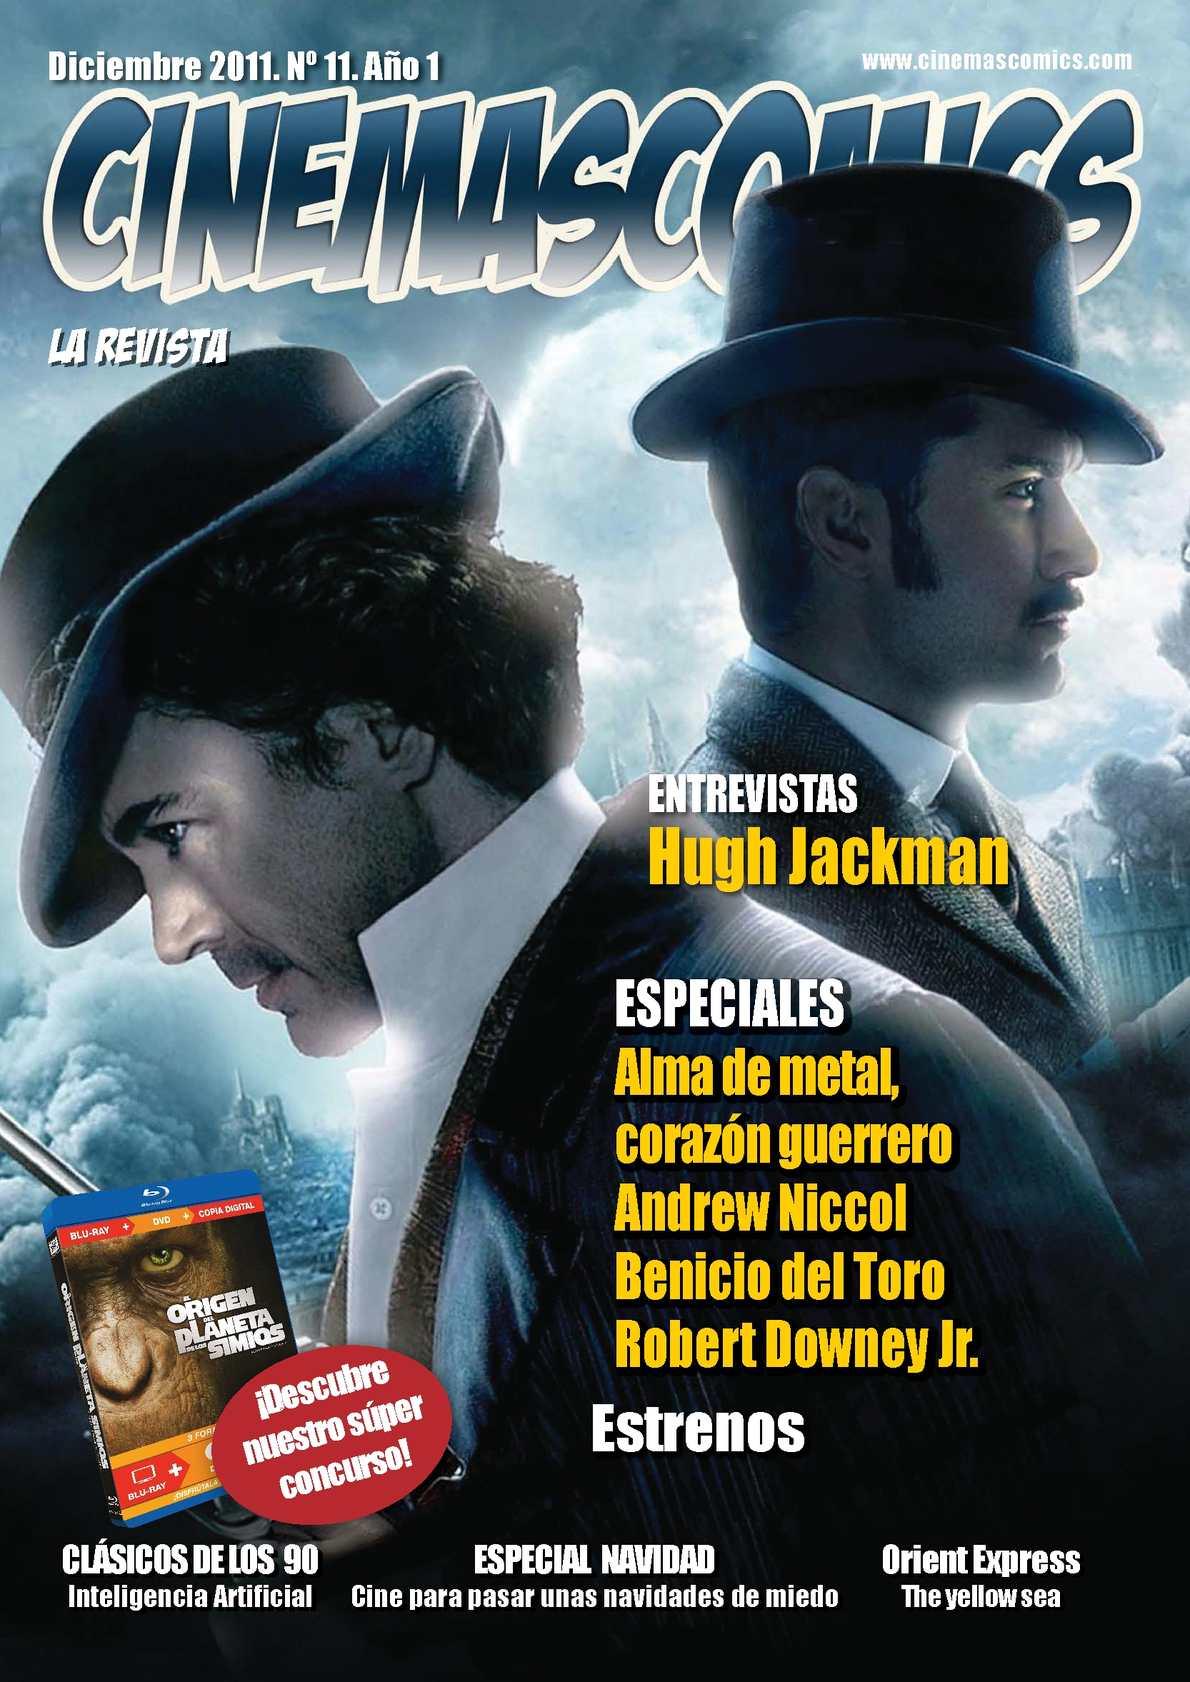 11 CinemascomicsLa Calaméo RevistaNº RevistaNº Calaméo 11 Calaméo CinemascomicsLa RevistaNº CinemascomicsLa wPnOX80k